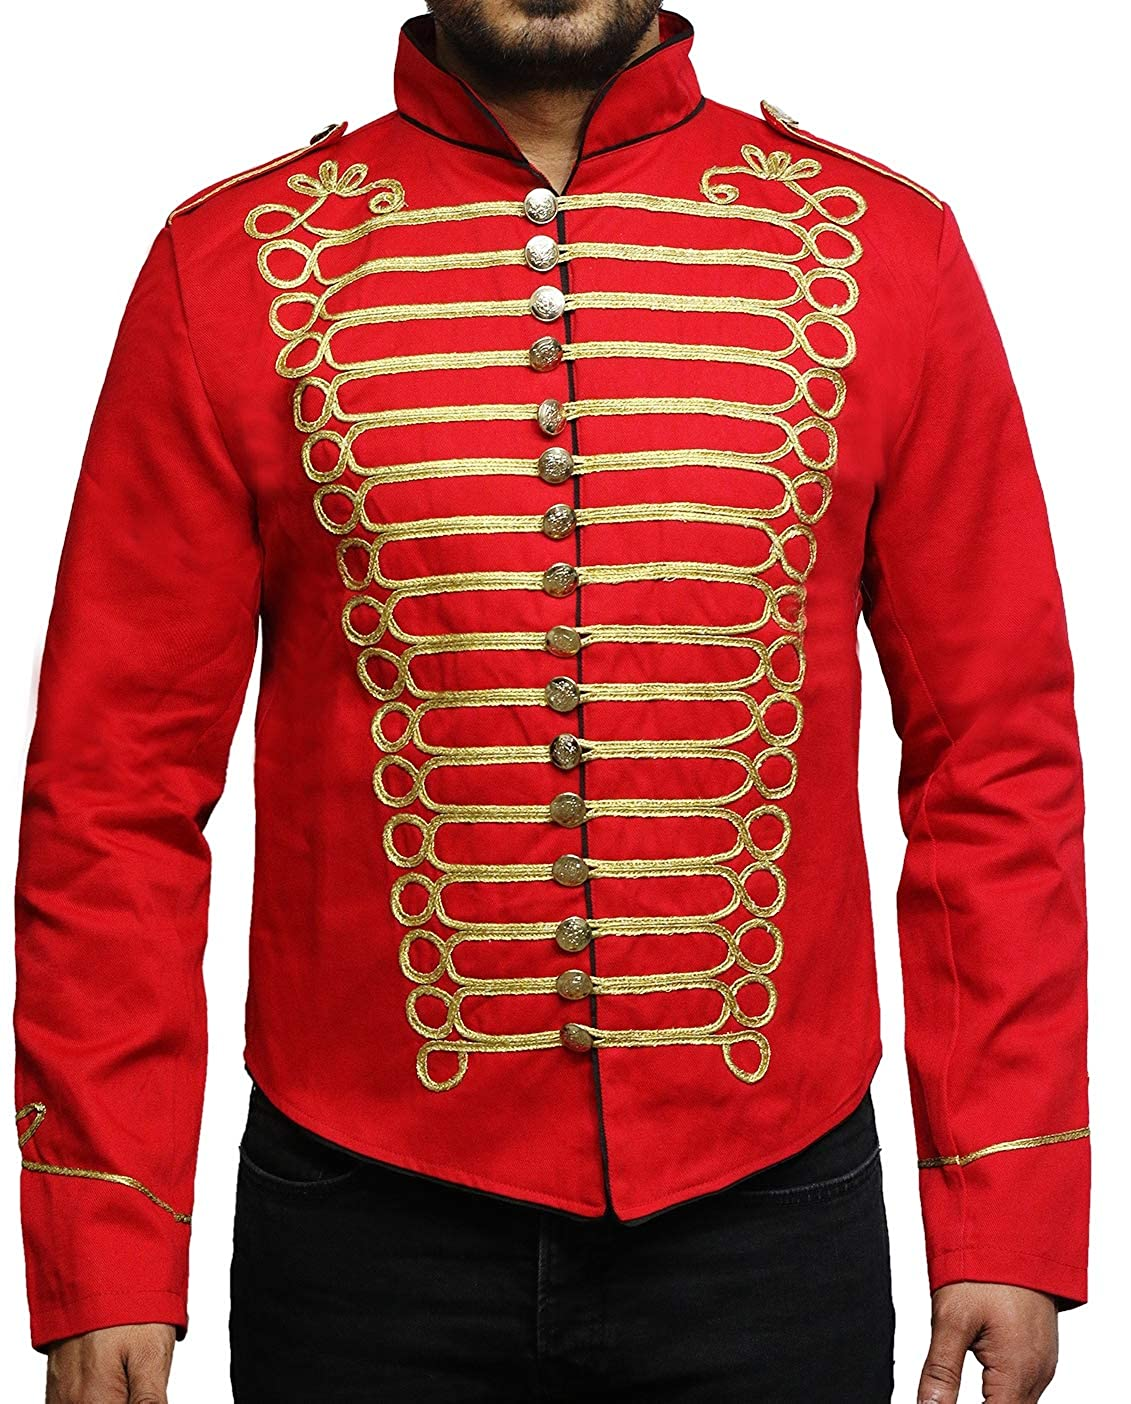 DARK REBELS Women Hussar Napoleonic Military Parade Jacket